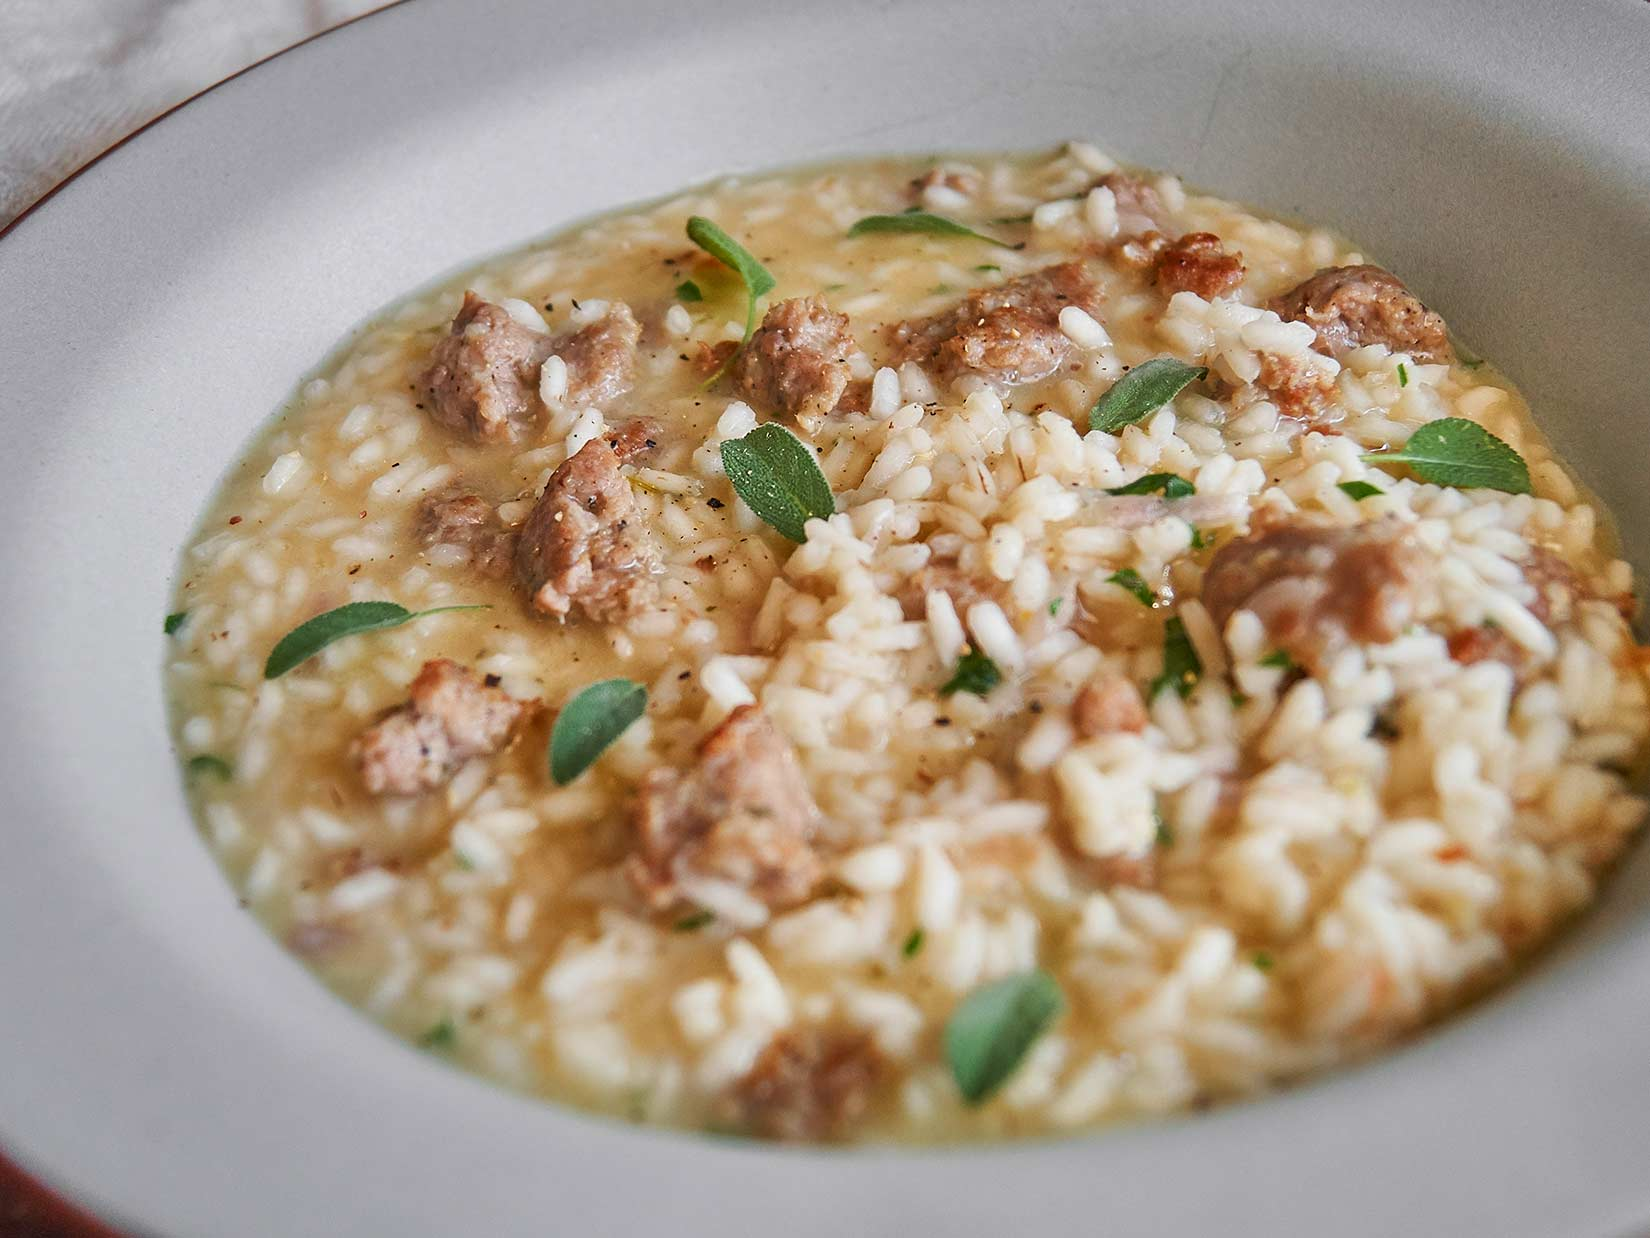 Salsiccia-Rezept für würziges Risotto